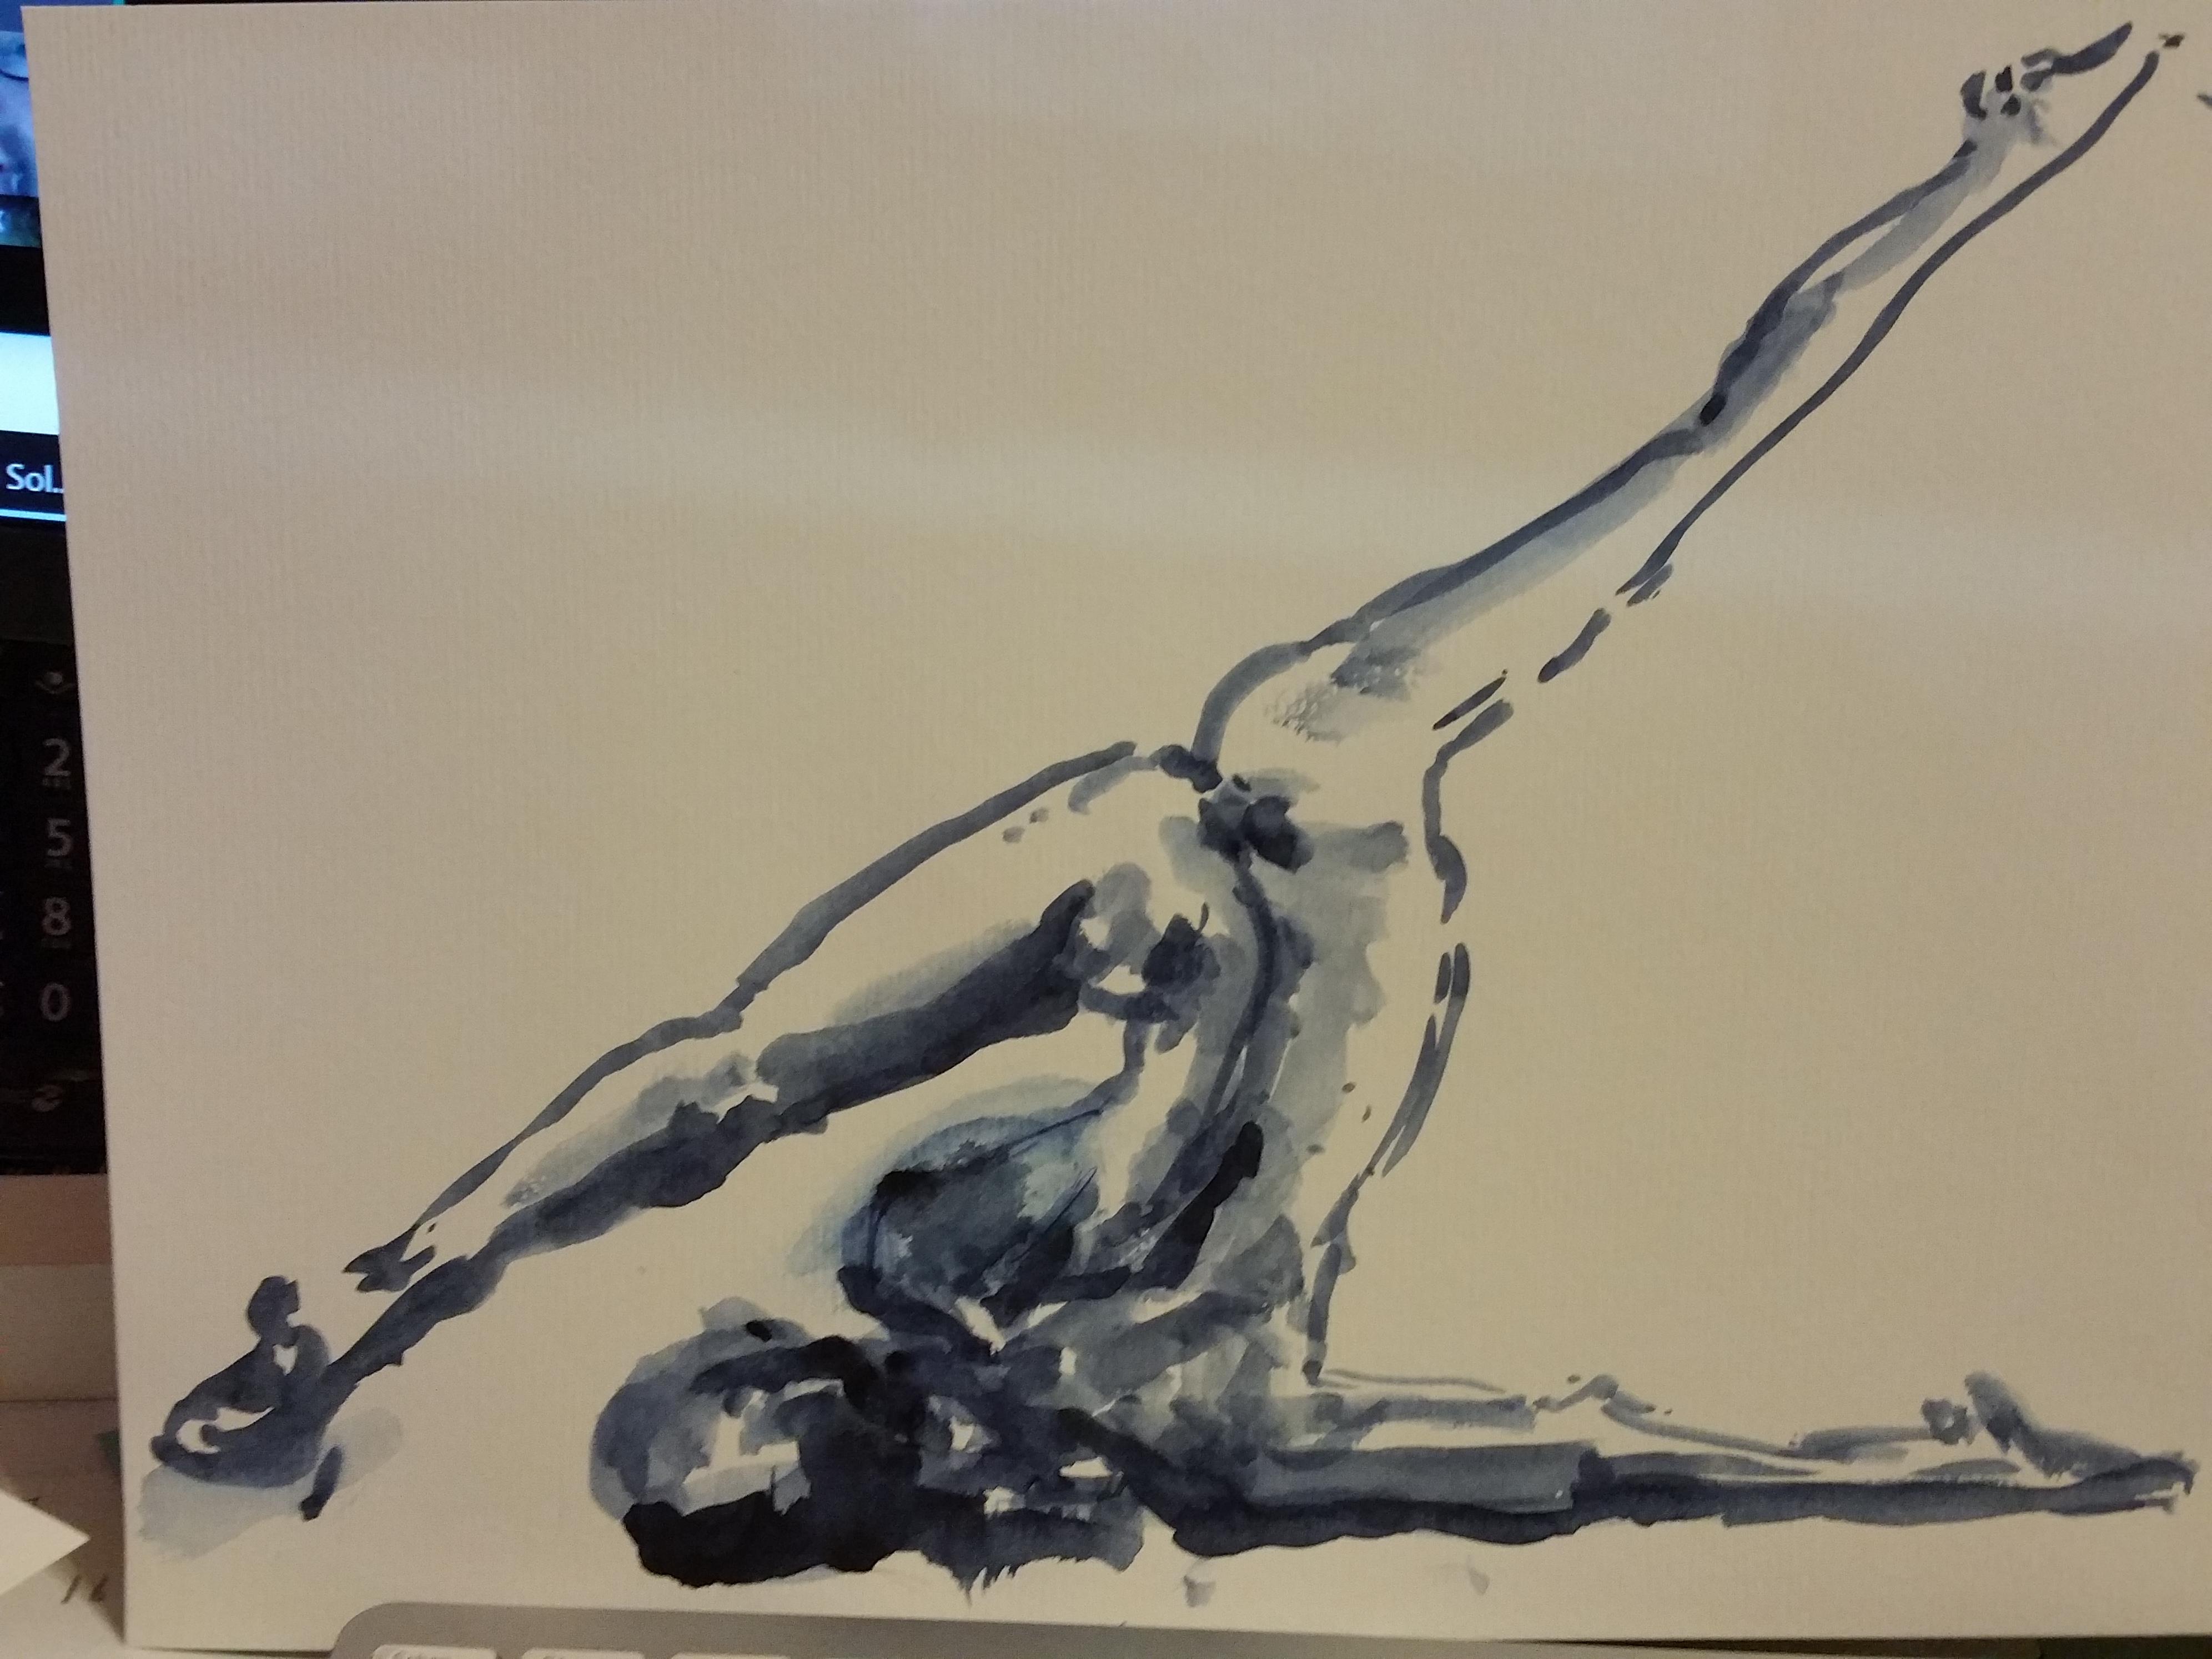 dessin dance aquarelle bleu  cours de dessin